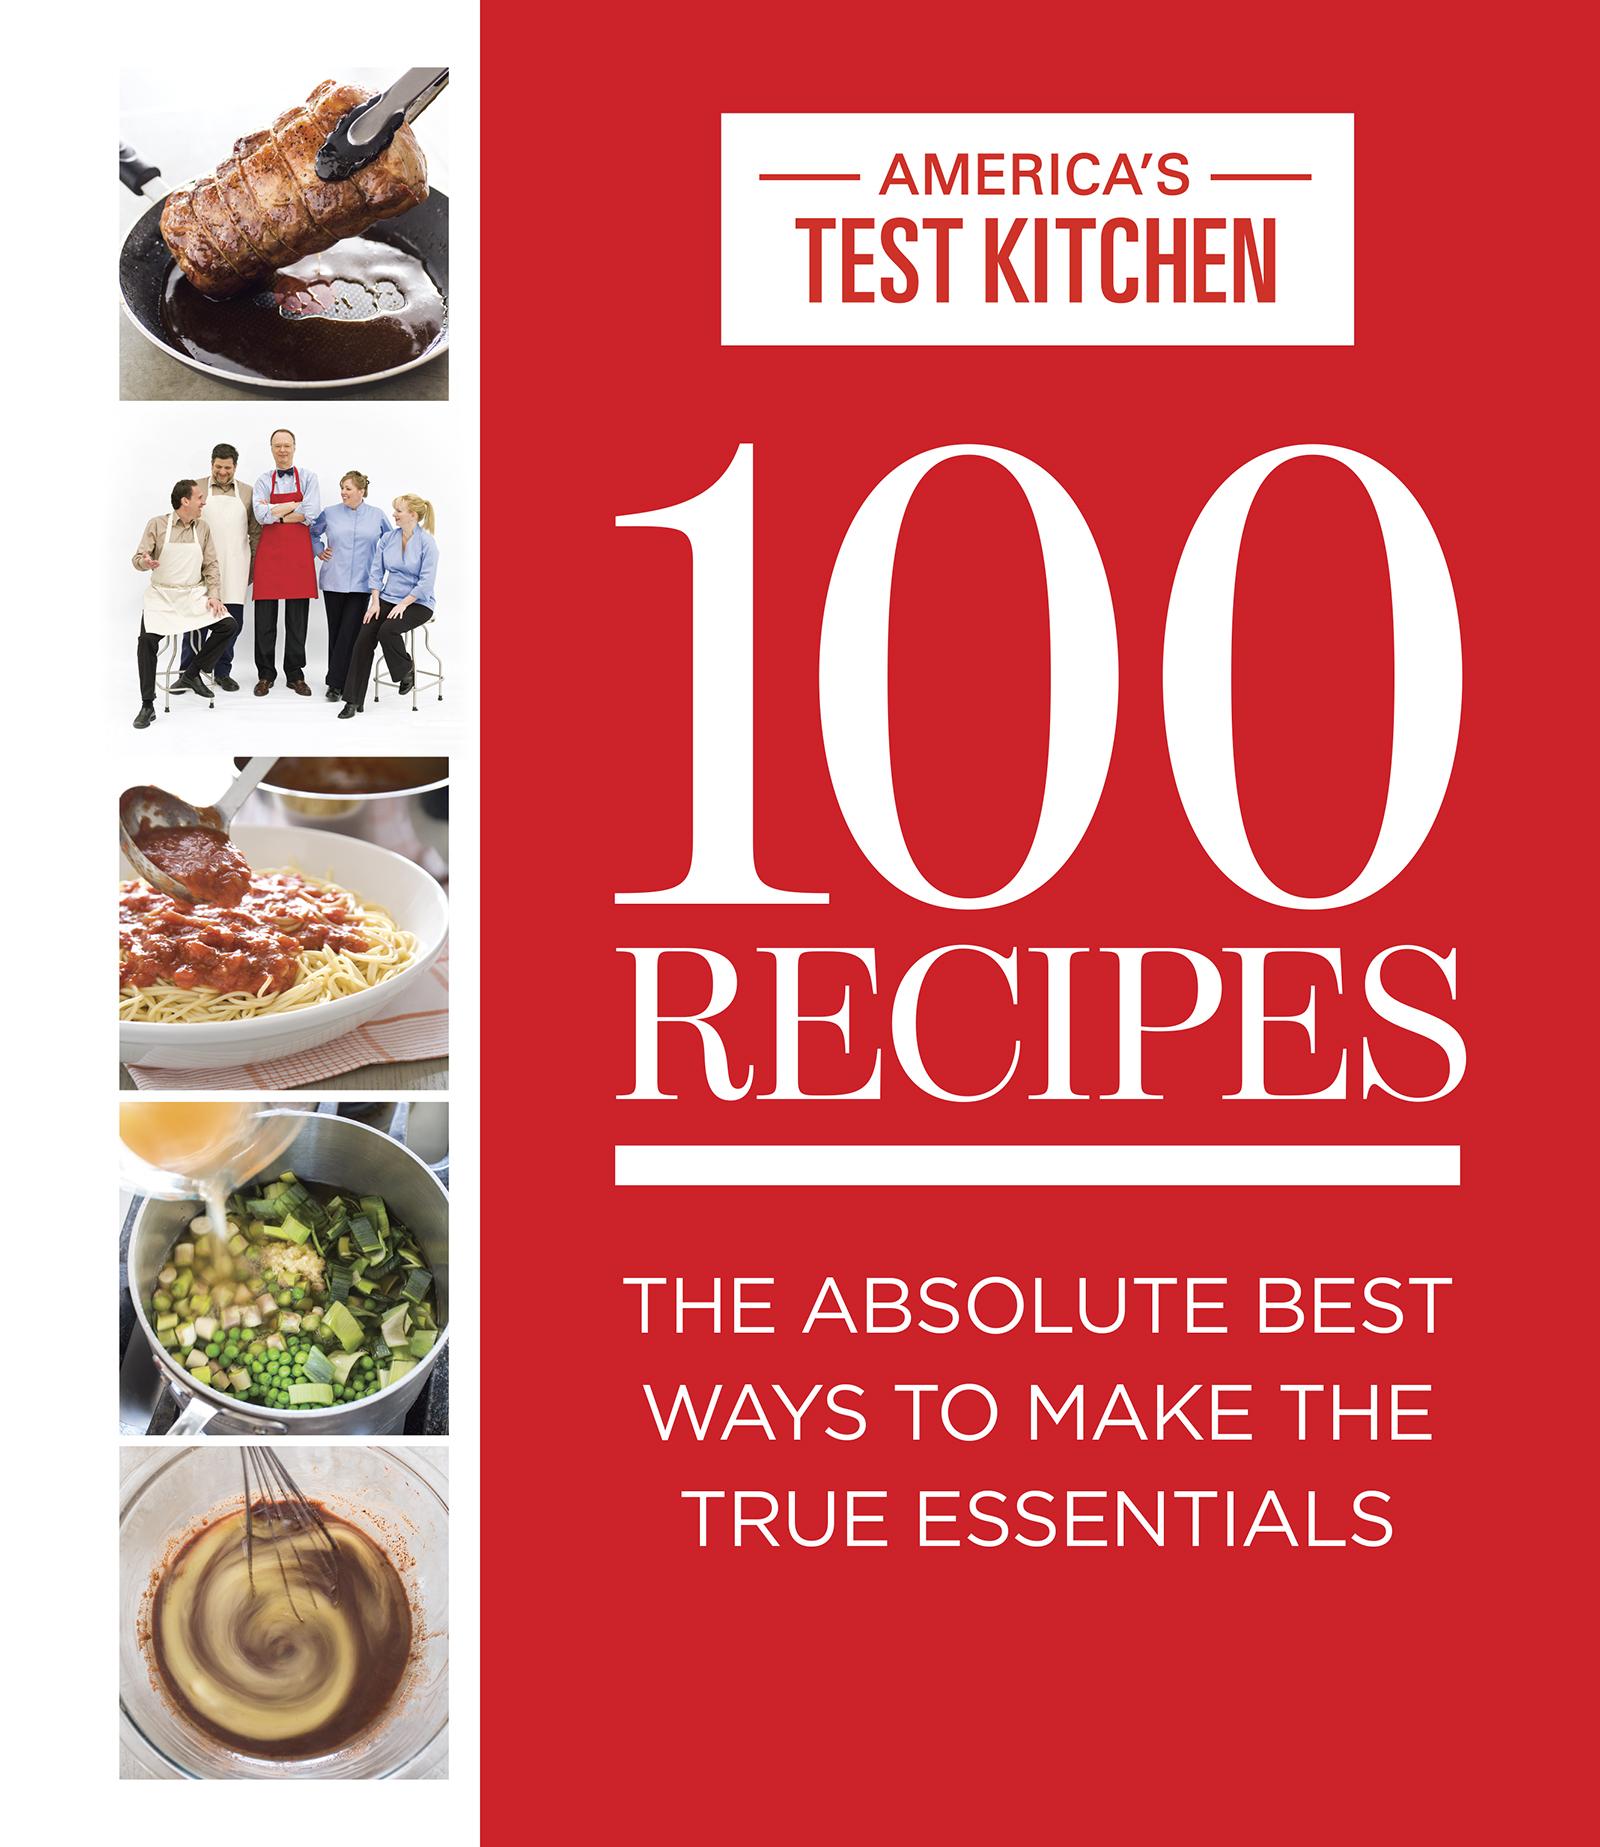 Americas Test Kitchen 100 Recipes  The Absolute Best Ways to Make the True Essentials